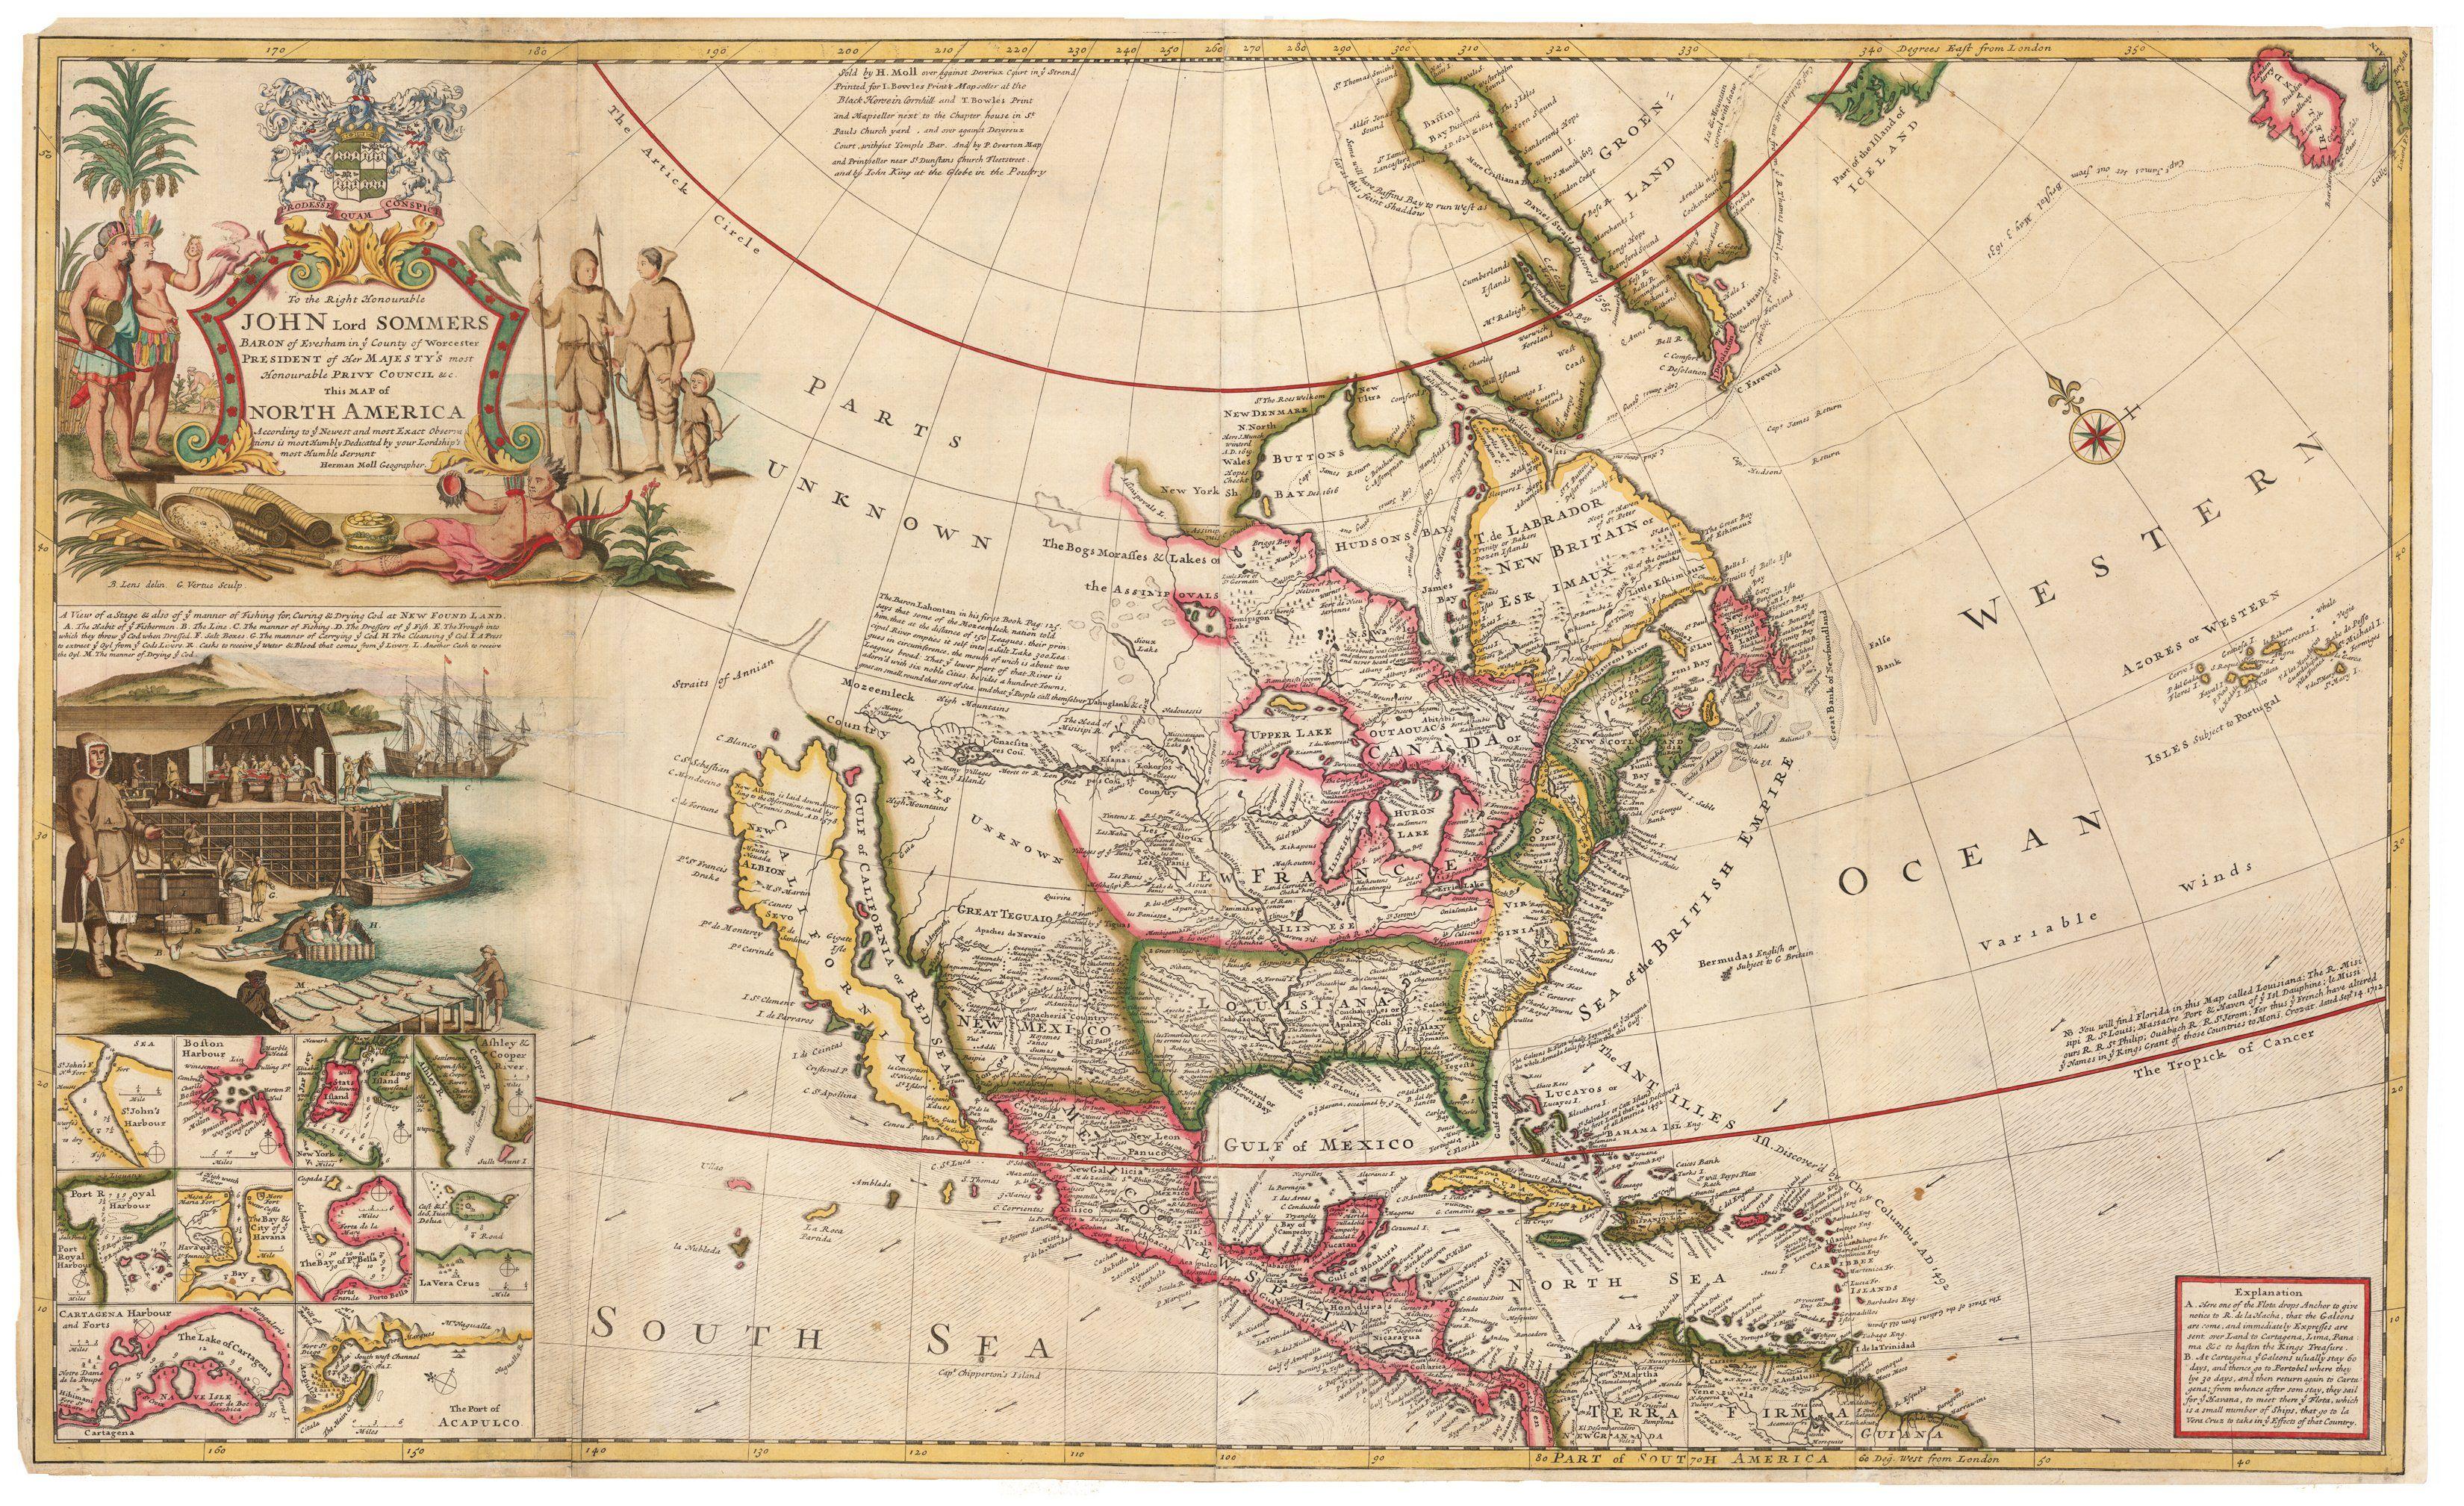 1720 …This Map of North America According to Ye Newest and ... on america shopping, america atlas, america continent, america national anthem, america attractions, america google earth, america globe, america outline, america hemisphere, america weather, america people, america logo, america vector, america water bottle, america text, america acronym, america area, america art, america activities, america city,